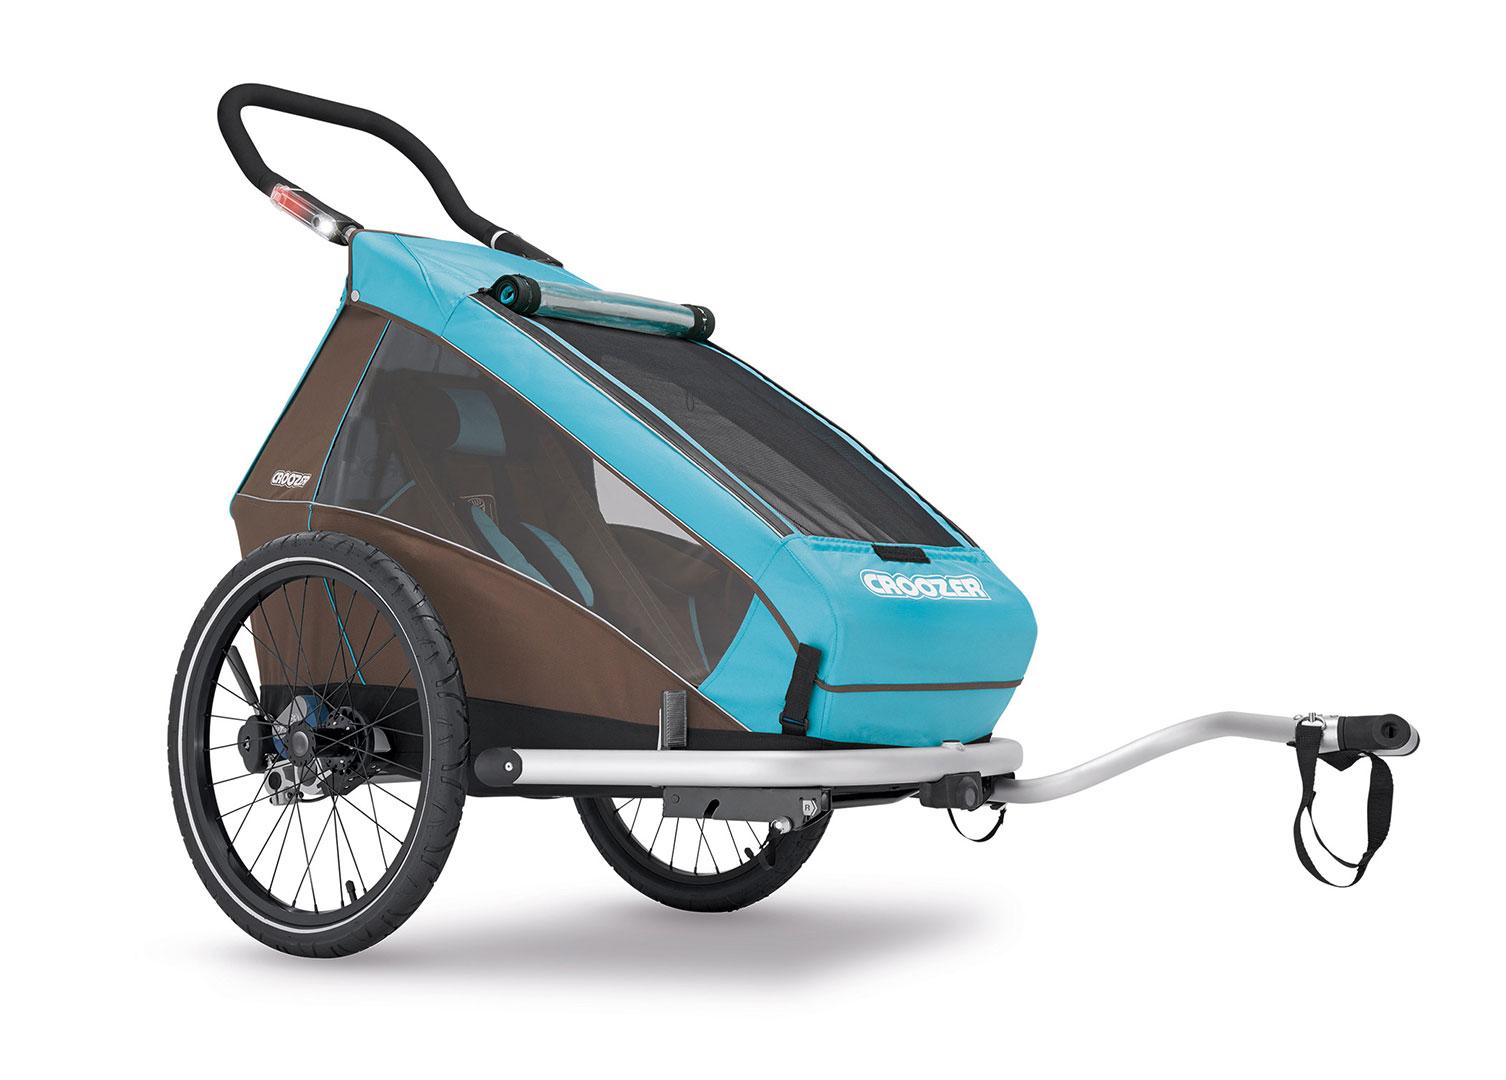 CROOZER KID FOR 1 PLUS Click & Crooz, 2016 - ZDARMA dopravné (Cyklovozík CROOZER KID FOR 1 PLUS Click & Crooz, model 2016, barva modrá, odpružený)